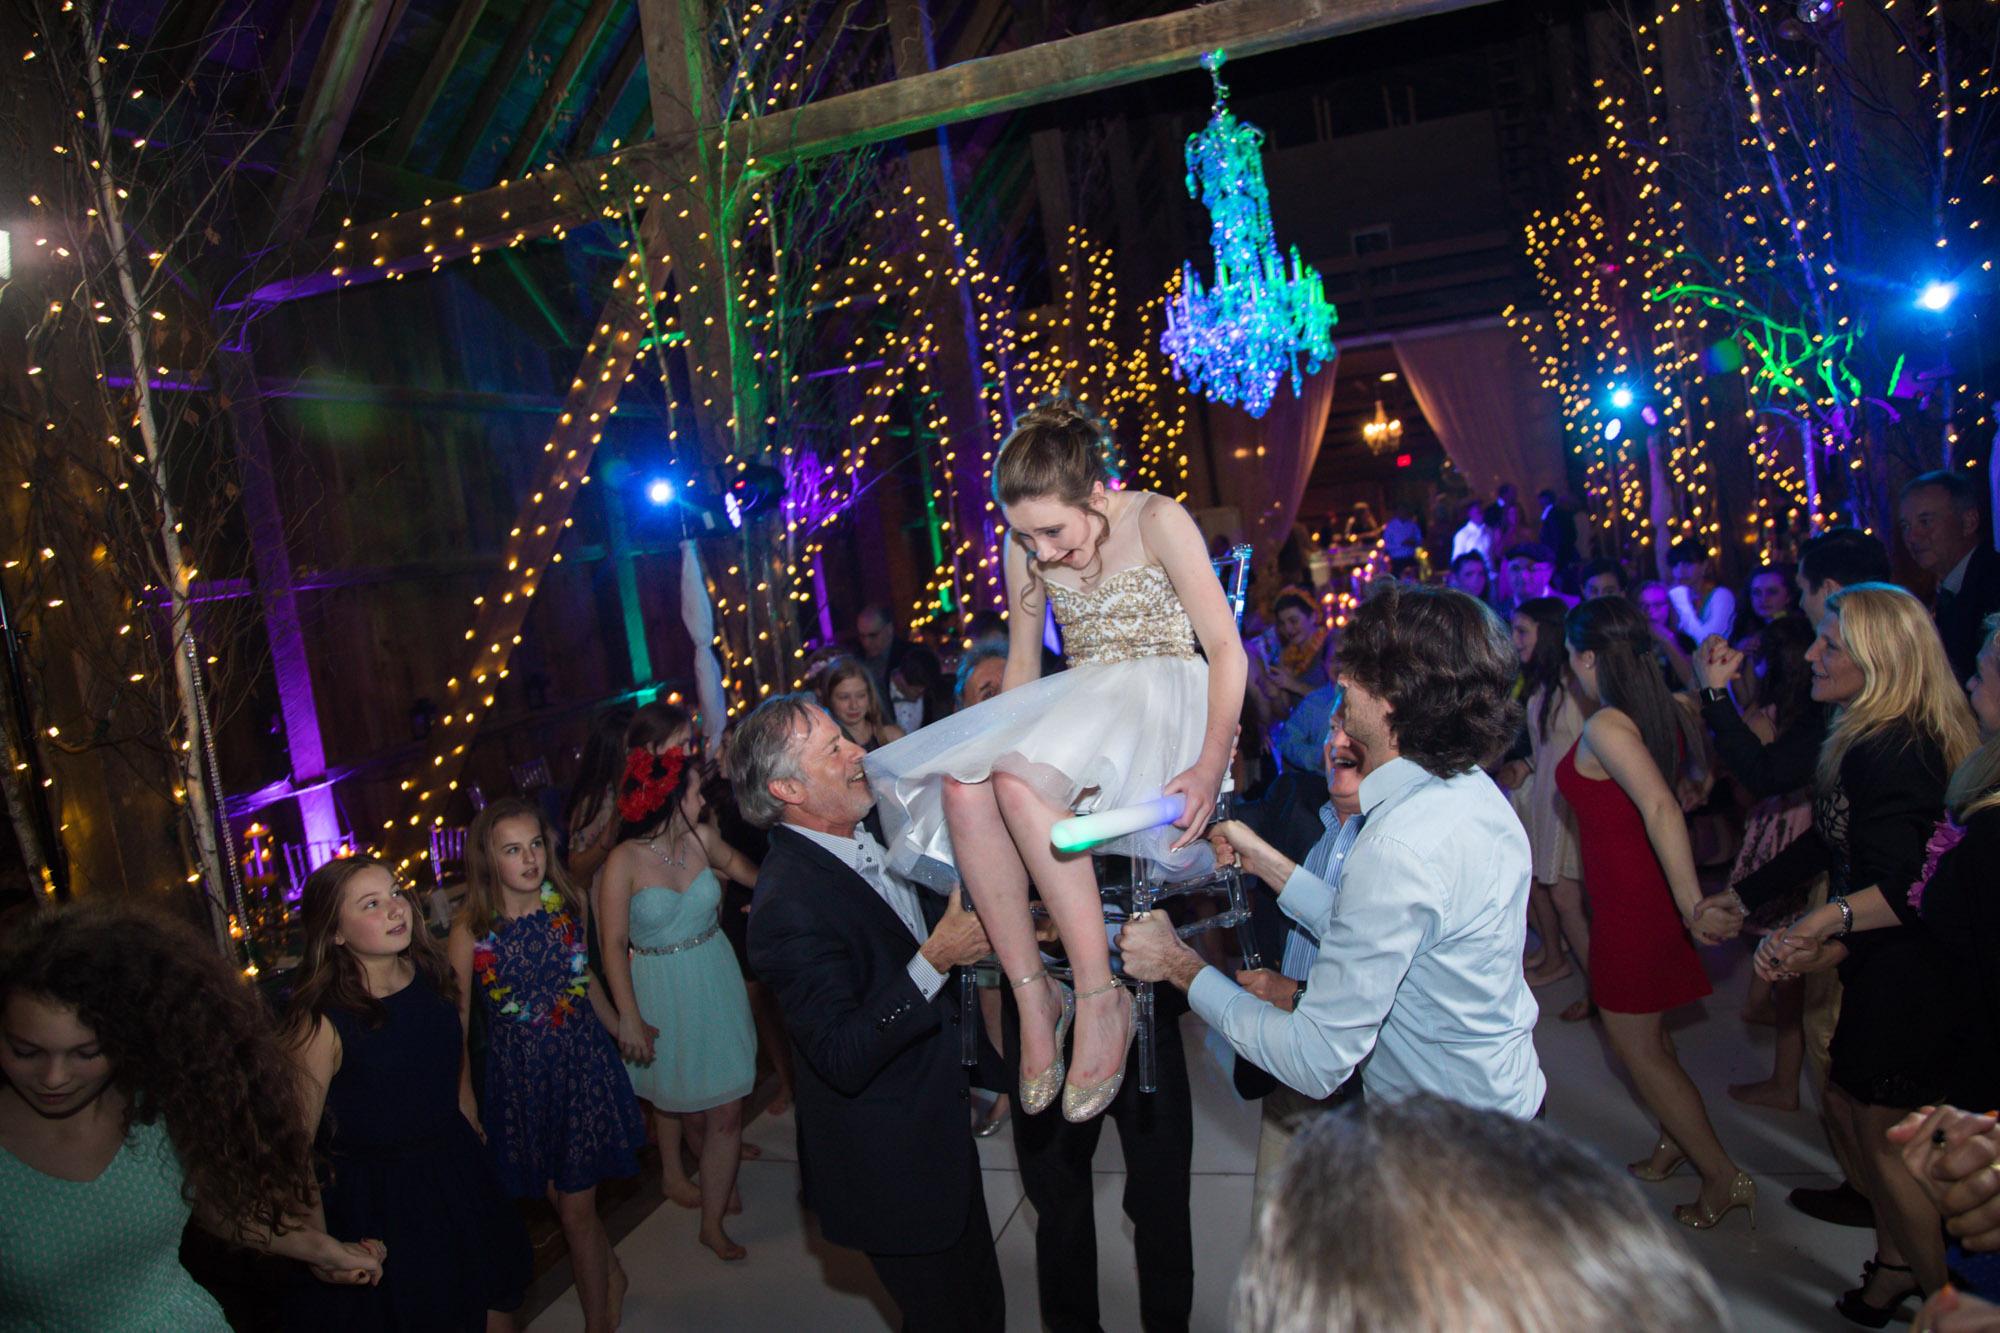 scranton_wedding_photographer_lettieri_pa (17 of 27).jpg